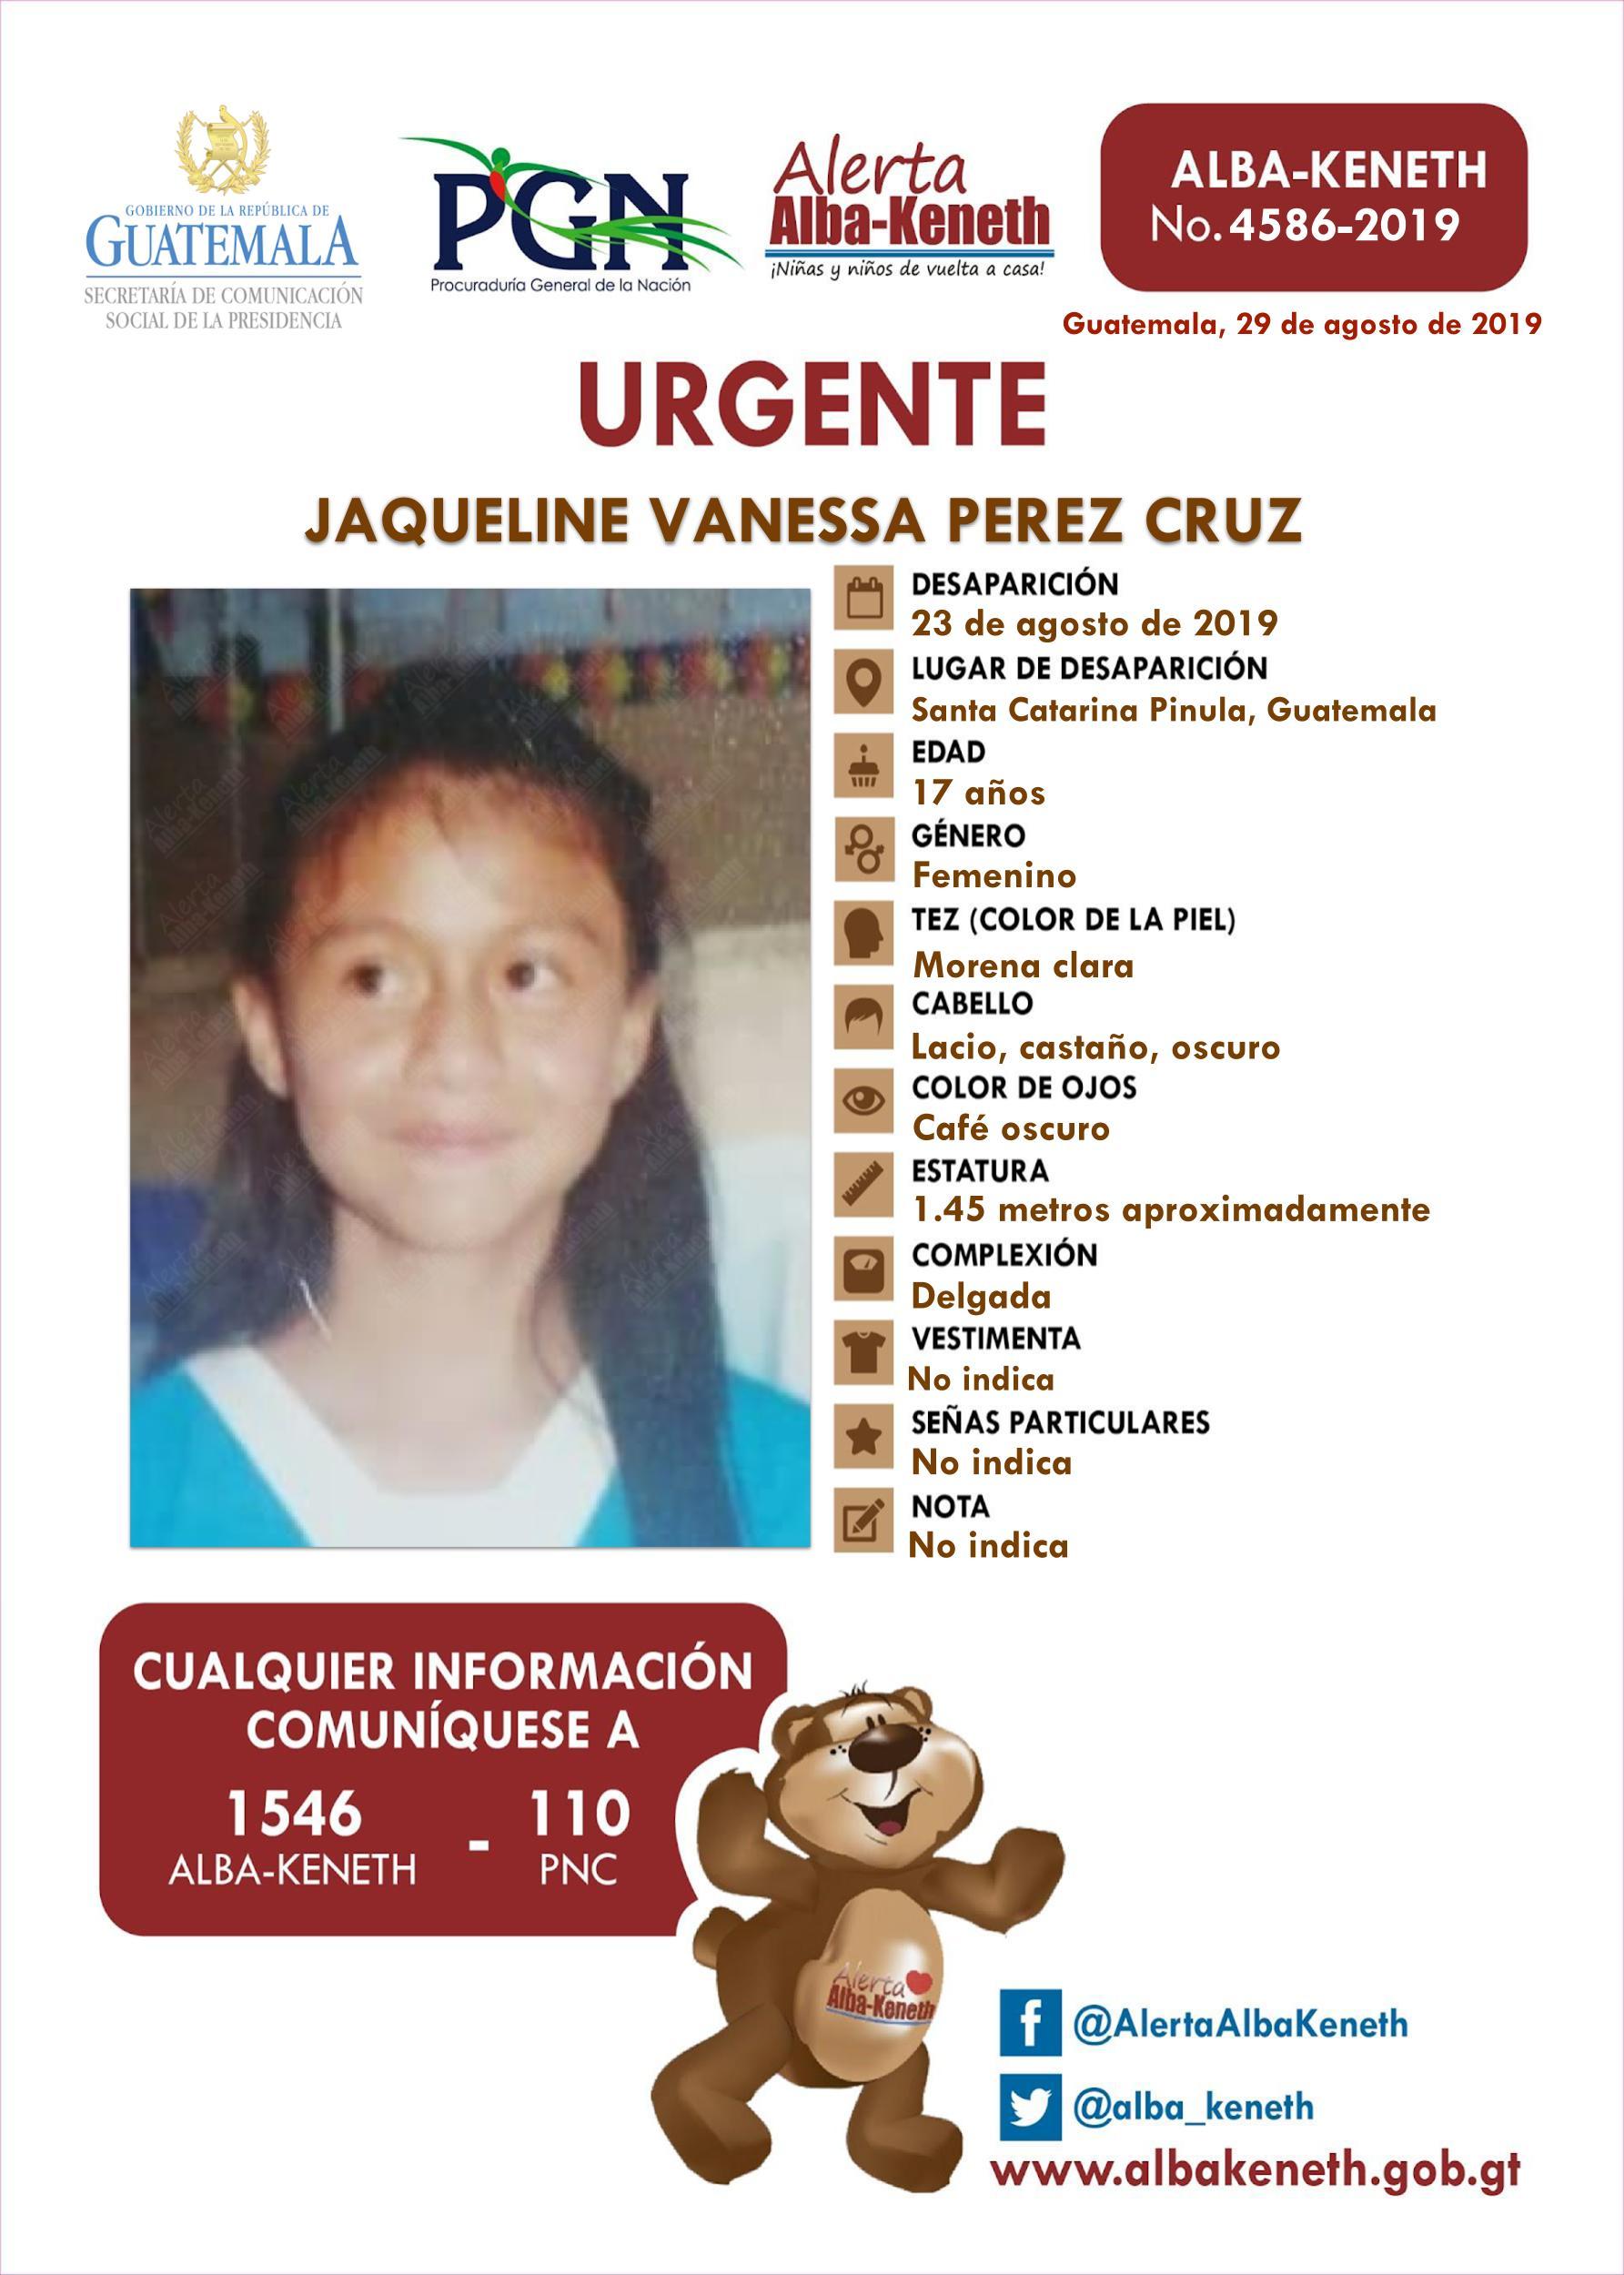 Jaqueline Vanessa Perez Cruz